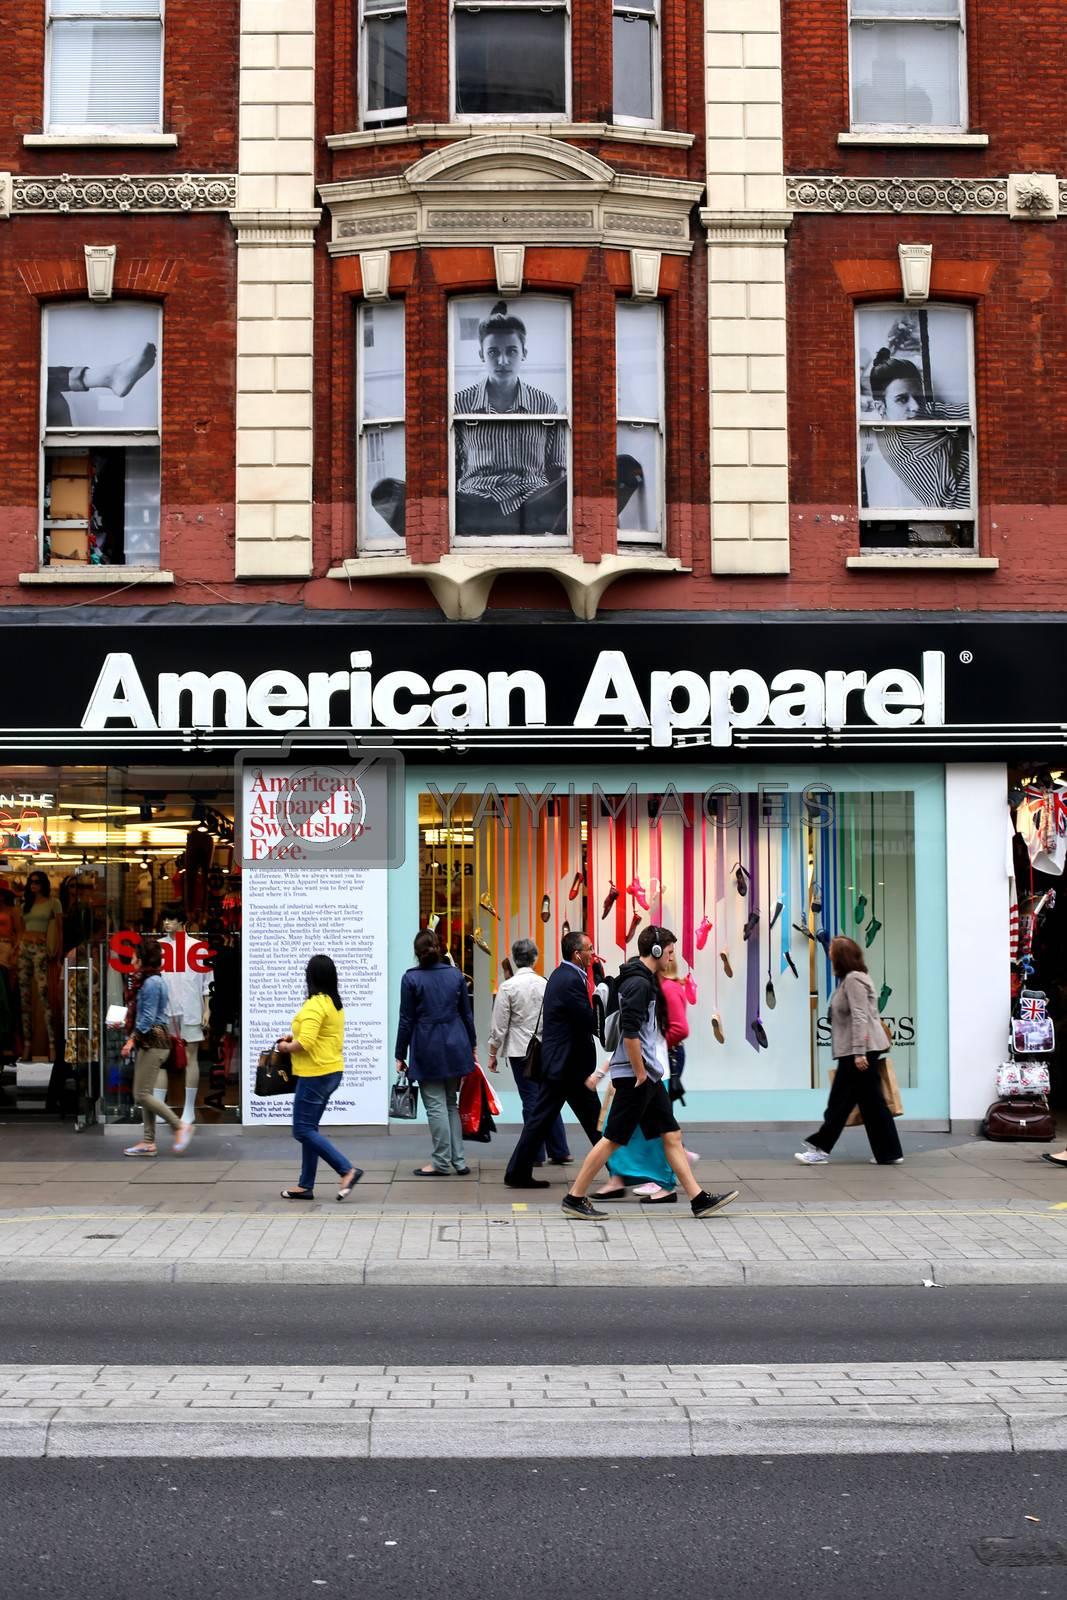 American Apparel Oxford Street London by Whiteboxmedia